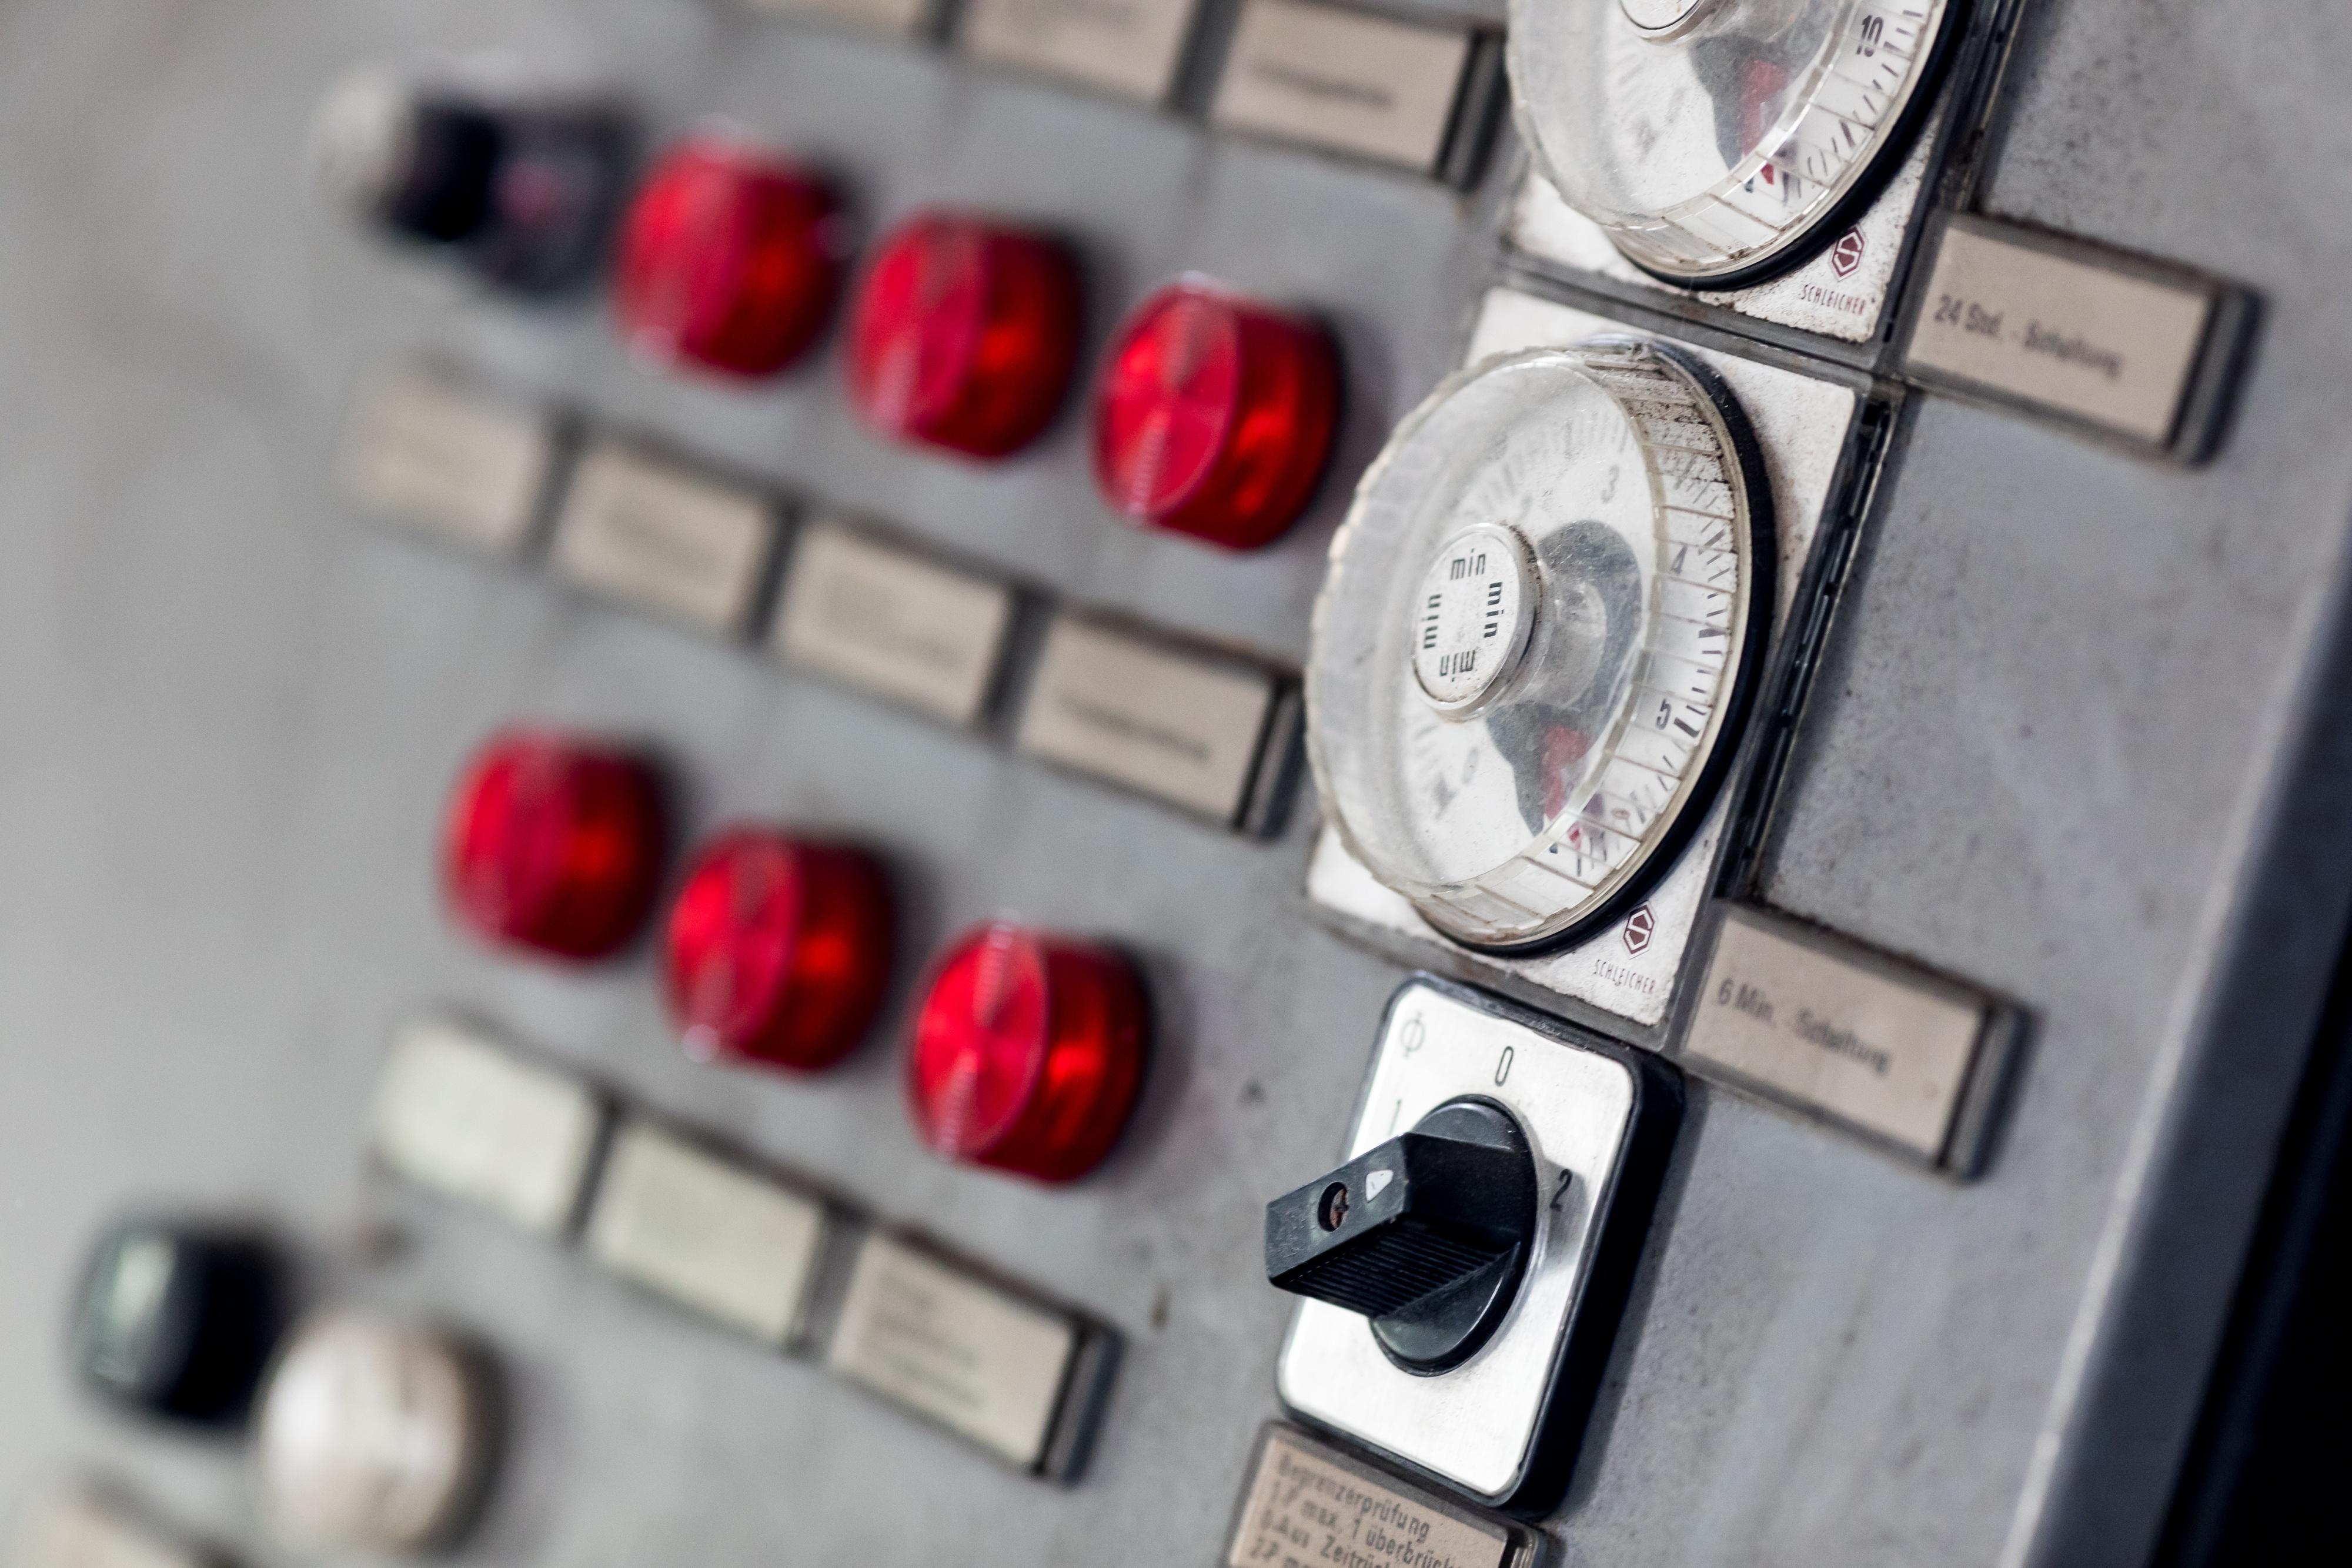 Control panel automation